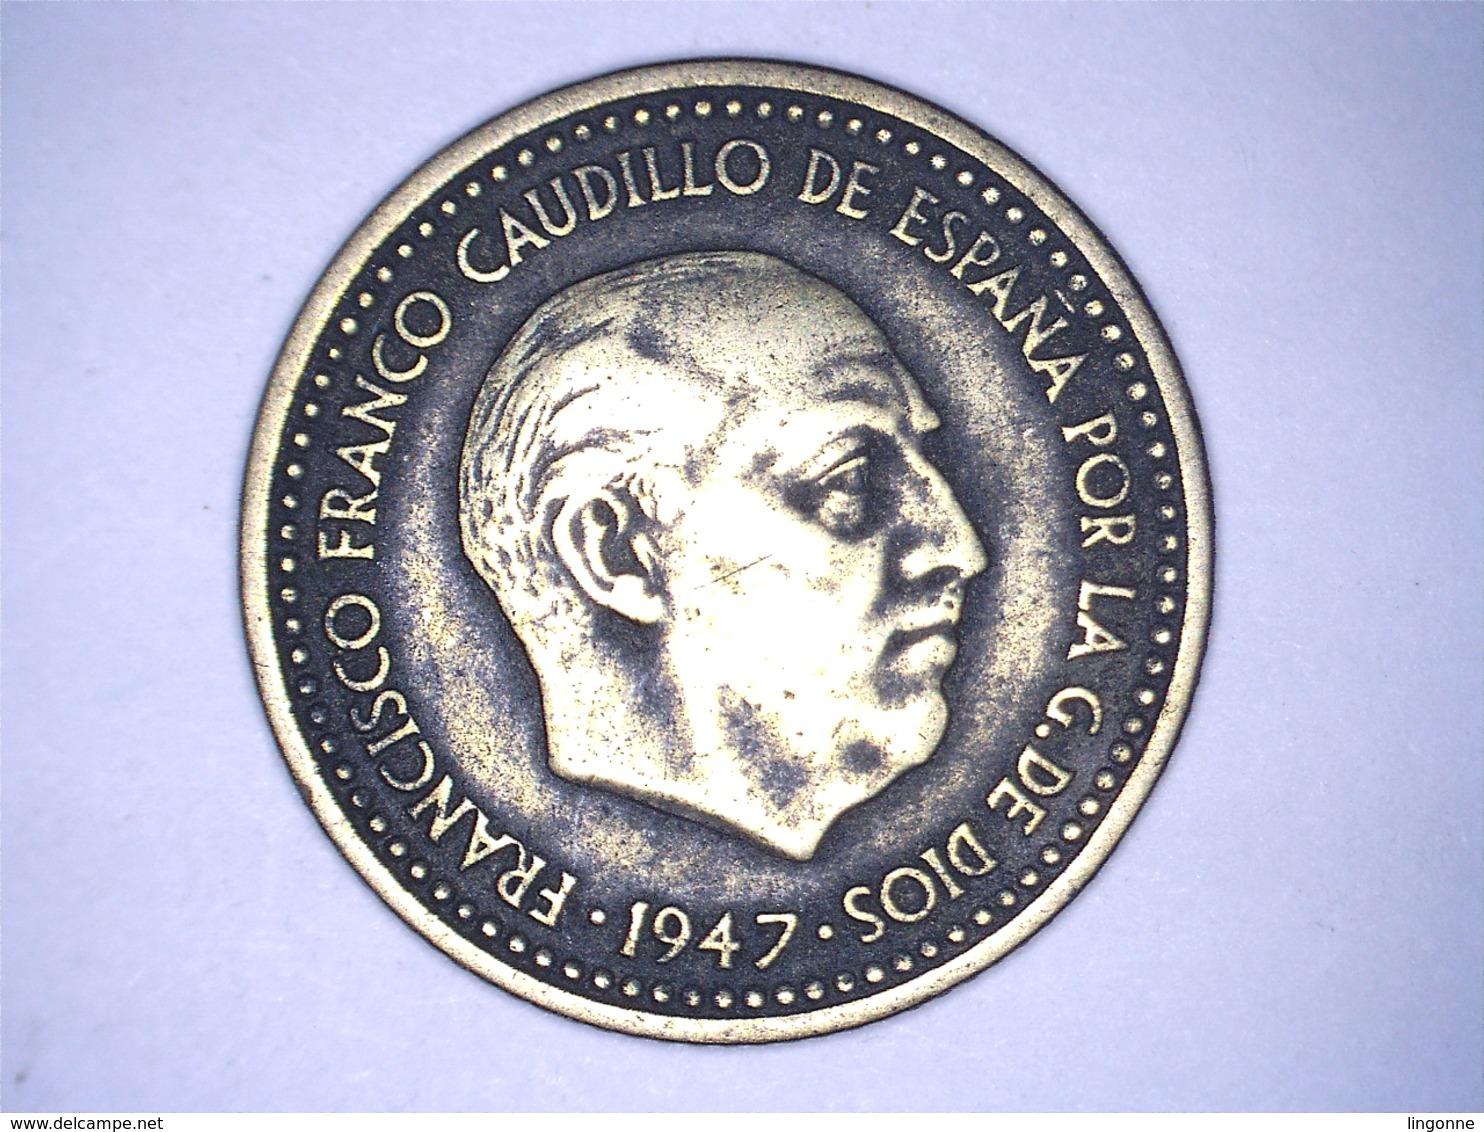 1947 - Espagne - Spain - UNA PESETA, ETOILE 49 - 1 Peseta